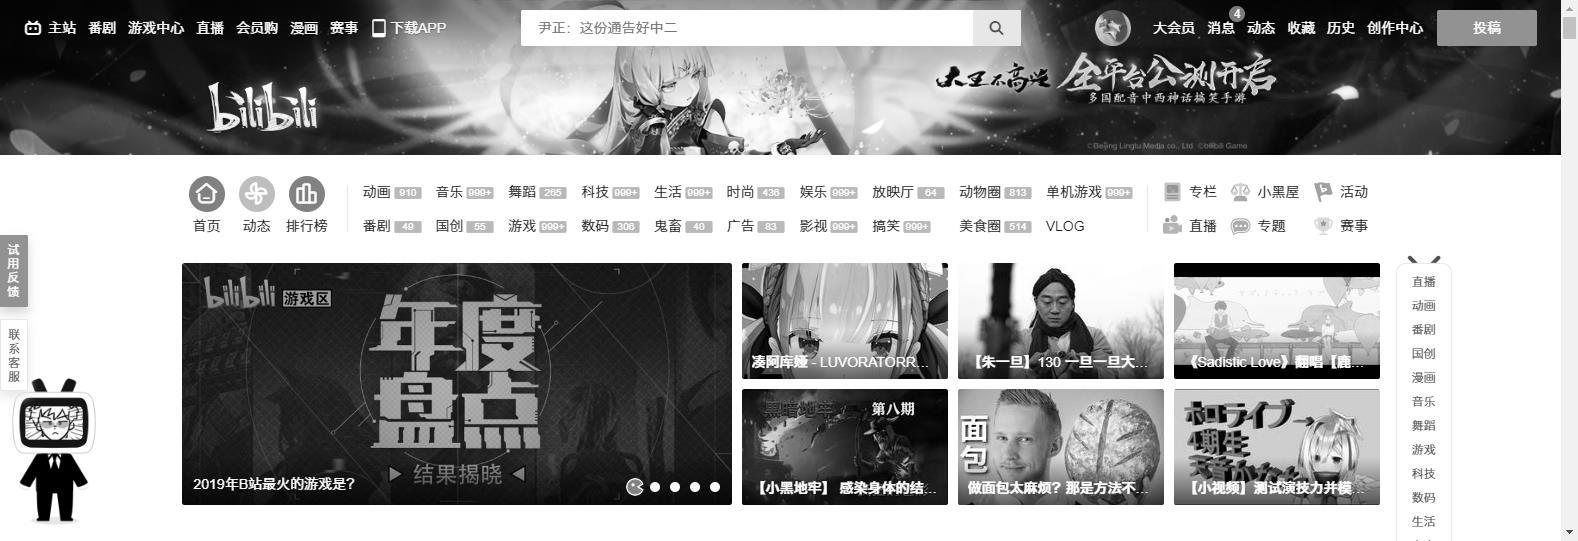 HTML黑白灰度页面的实现.jpg